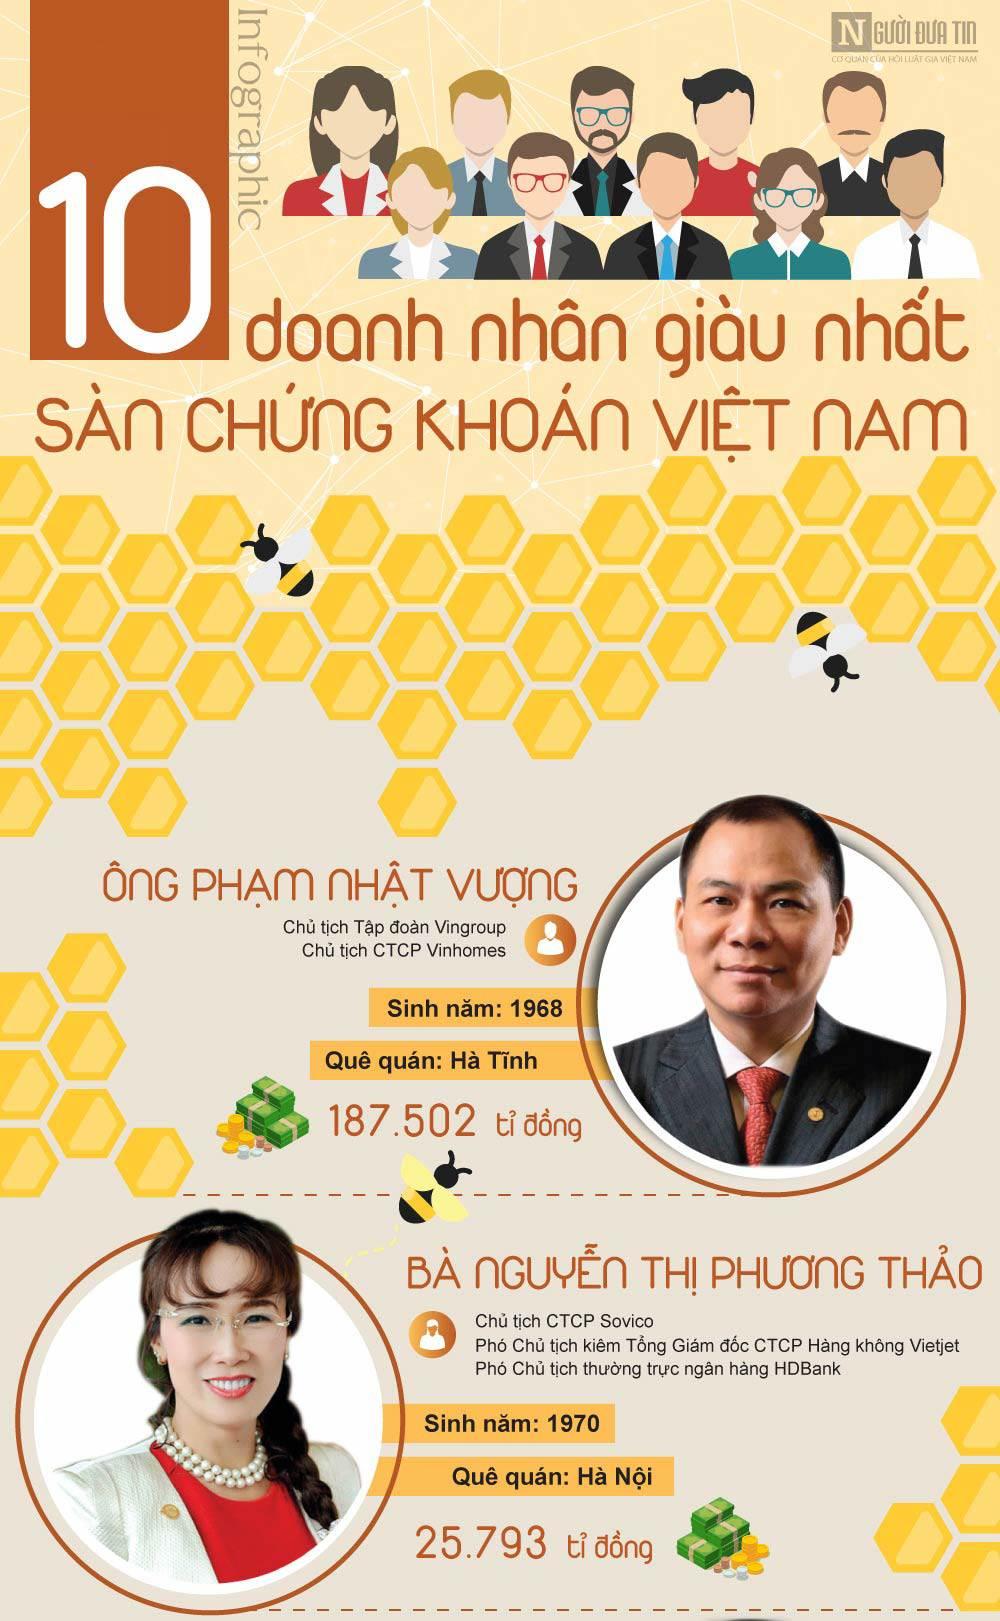 [infographic] khoi tai san khung cua 10 doanh nhan giau nhat viet nam - 1